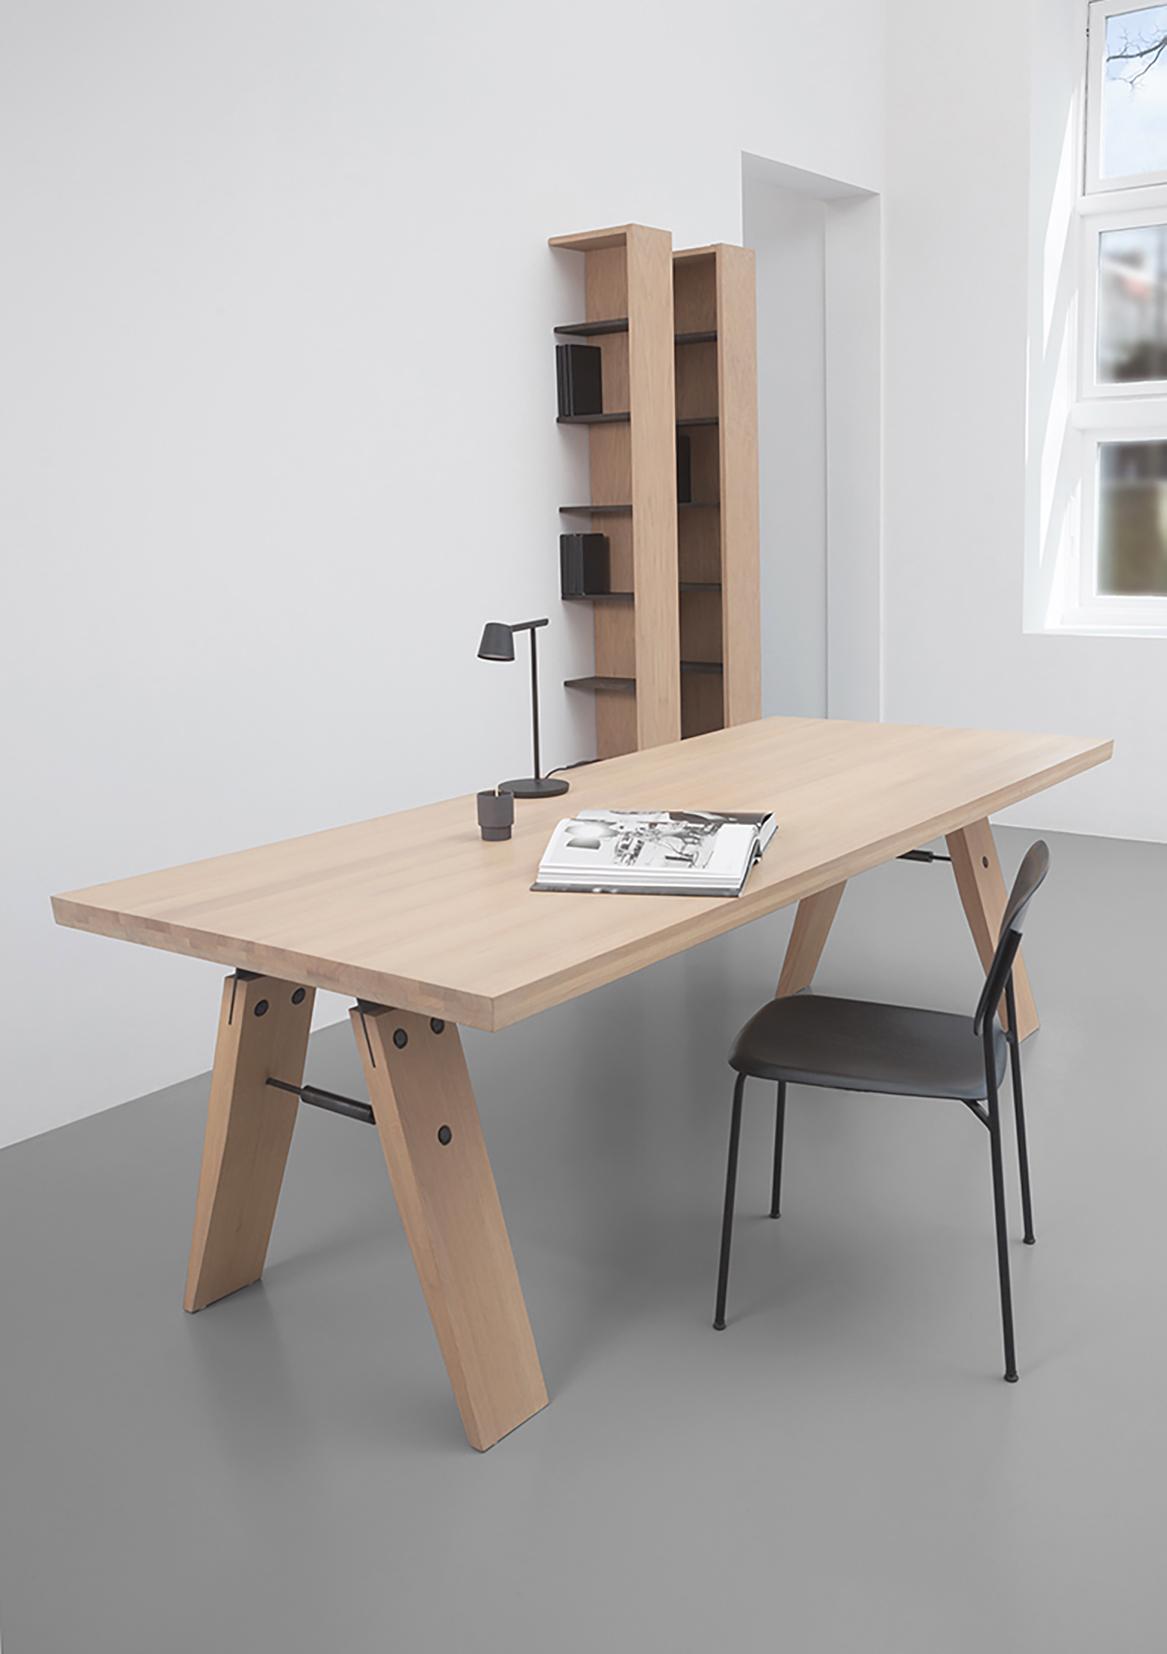 Wandplank Als Bureau.Design Nieuws I Eettafel Als Werktafel I Odesi Your Dutch